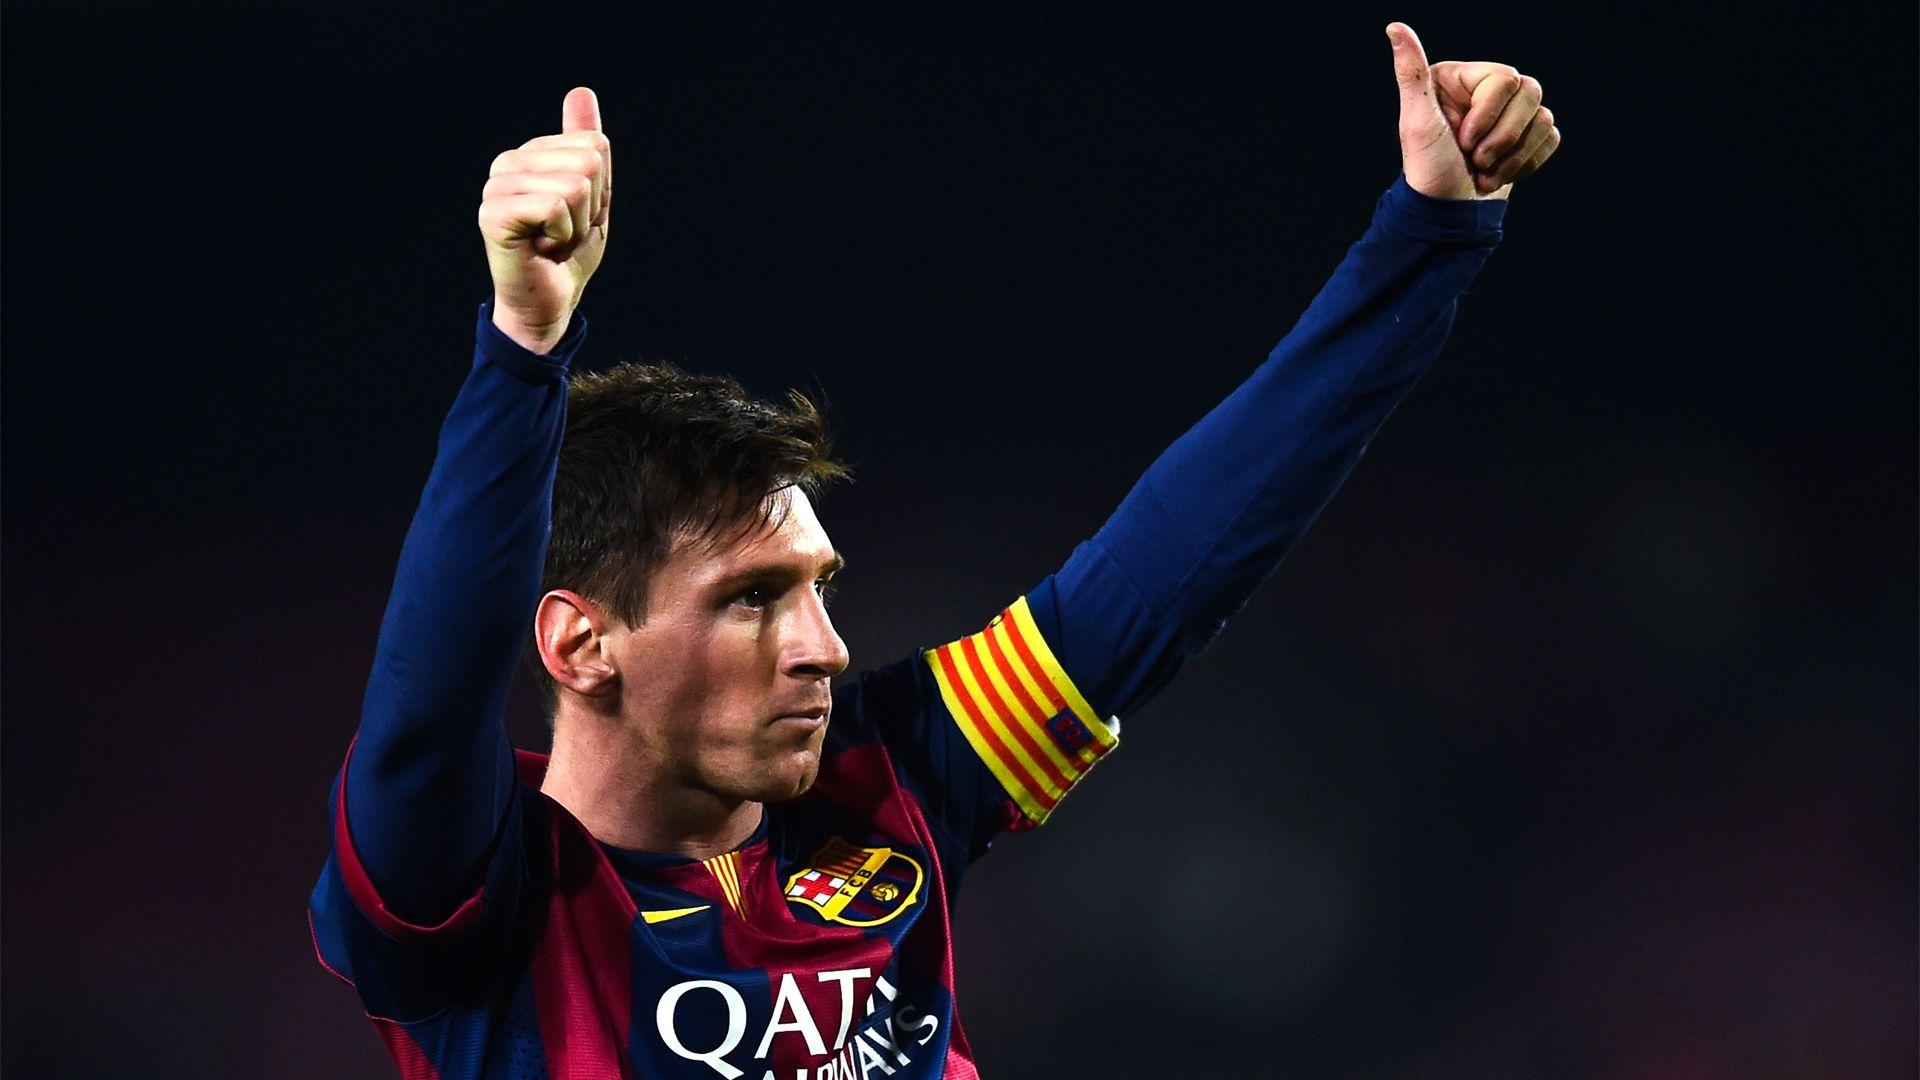 Messi Hd Wallpapers 1080p Best Wallpaper Hd Lionel Messi Wallpapers Lionel Messi Lionel Messi Barcelona